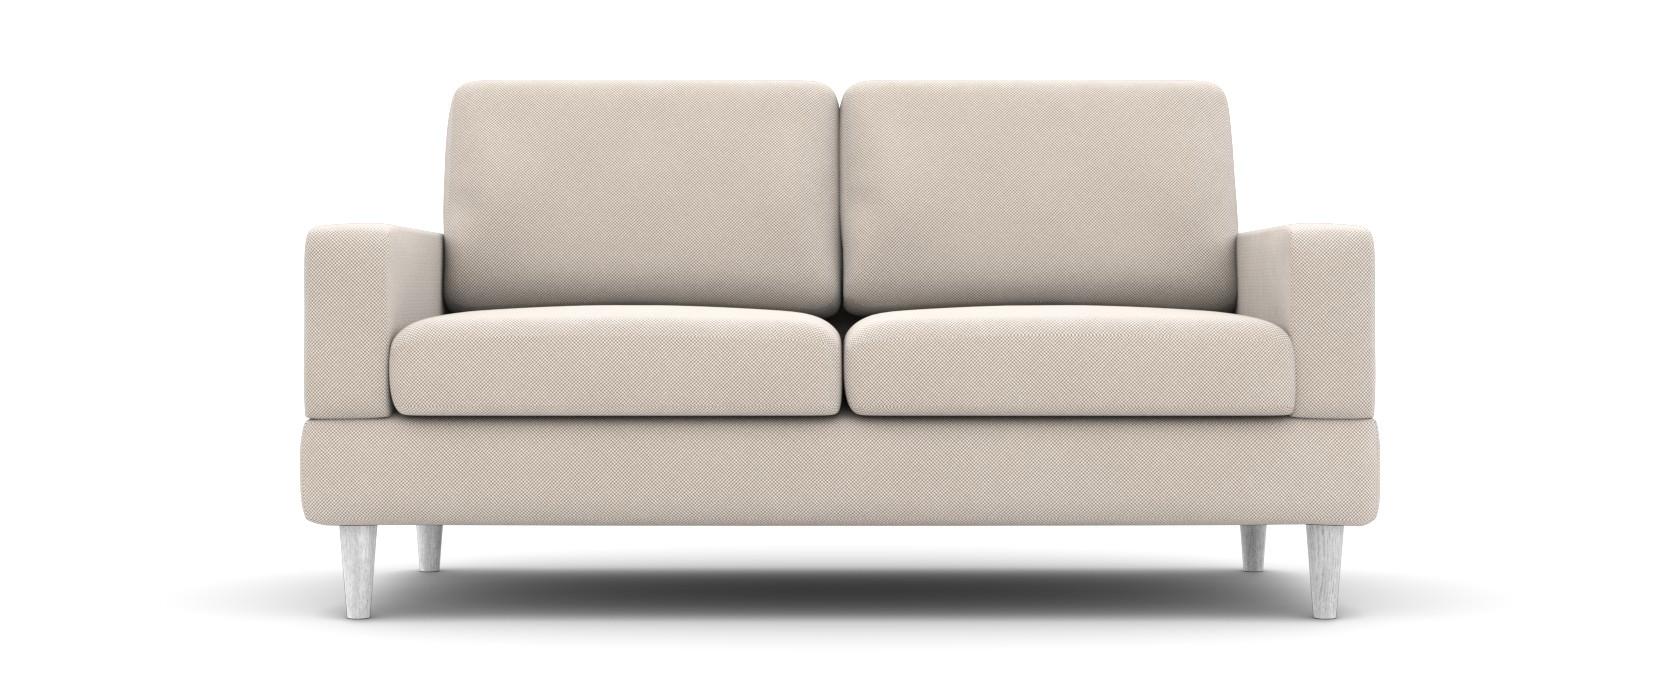 2-Sitzer Sofa Manfredo